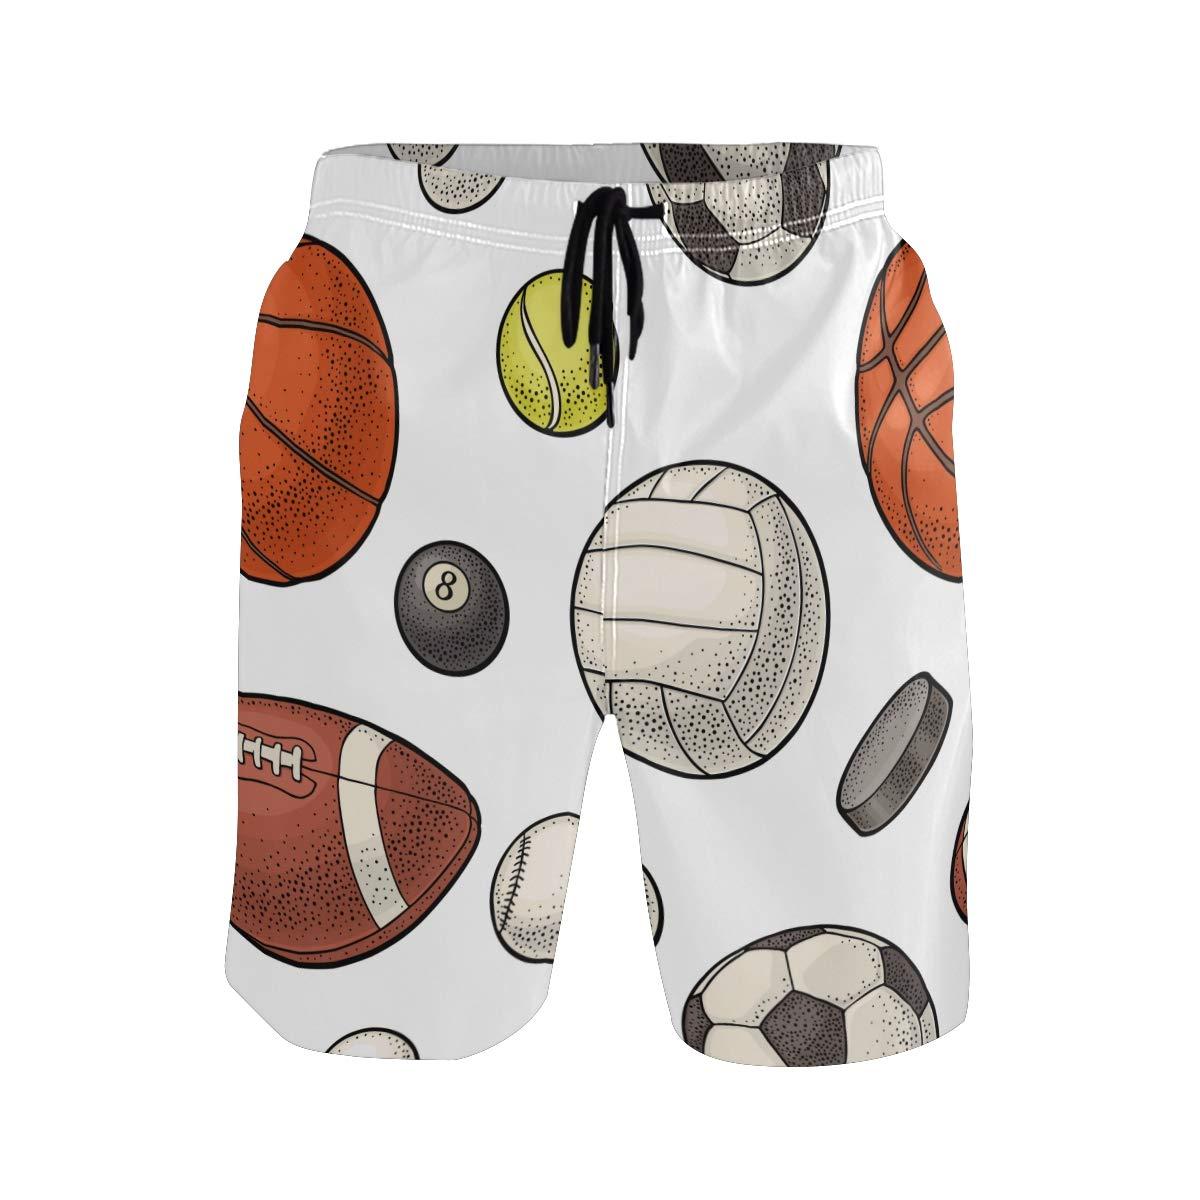 COVASA Mens Summer ShortsDifferent Kinds Sport Balls Isolated On White Backgro